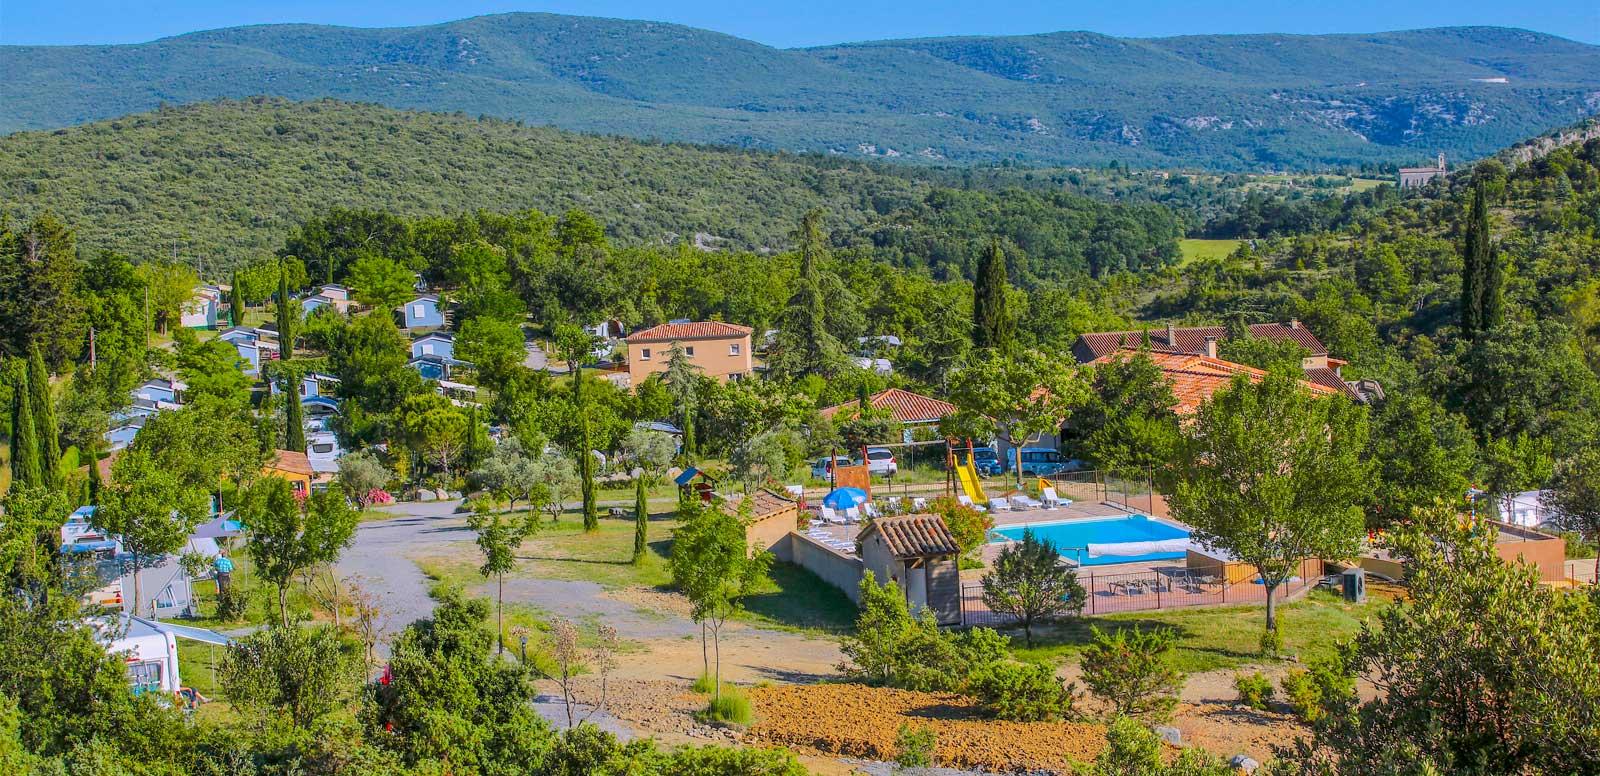 Vacances en camping Ardèche